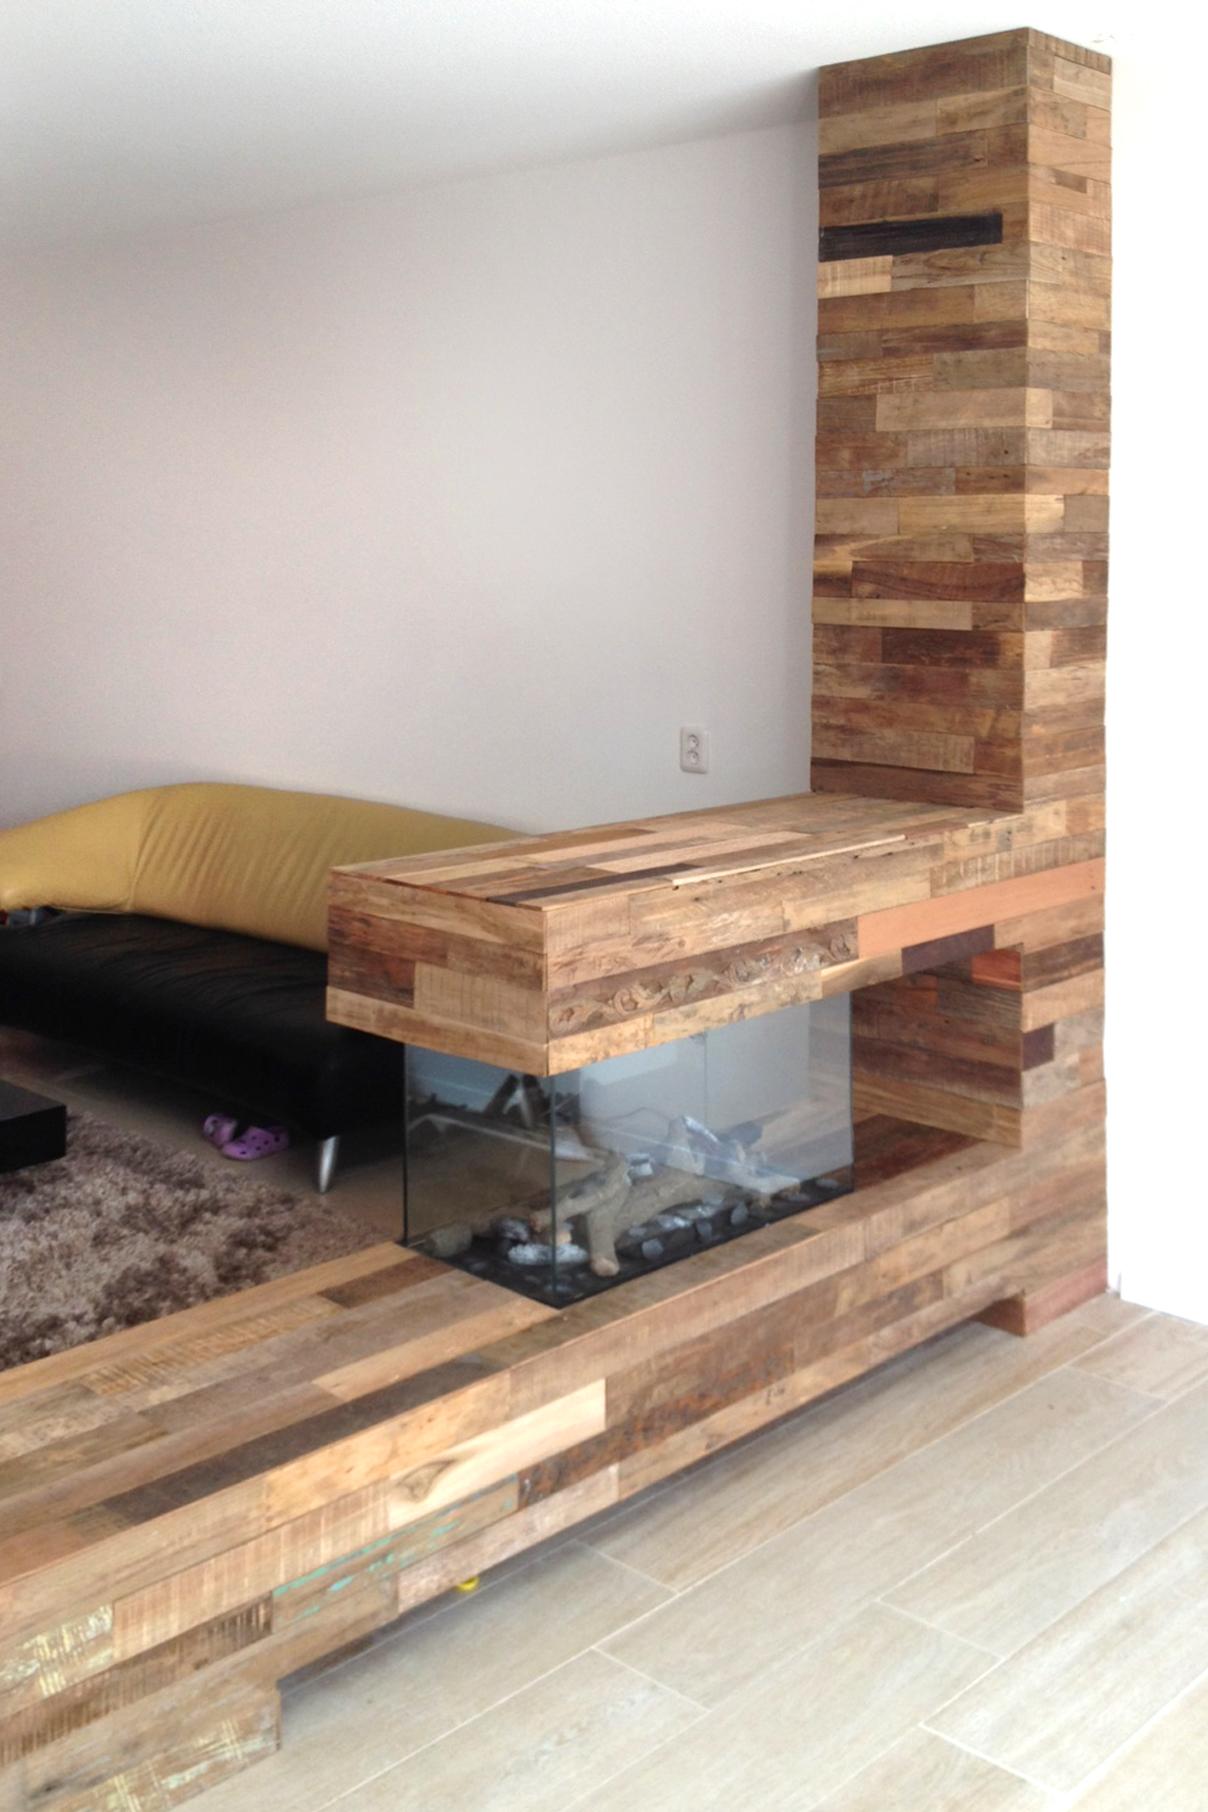 holz wandverkleidung b 1cm dick bs holzdesign. Black Bedroom Furniture Sets. Home Design Ideas